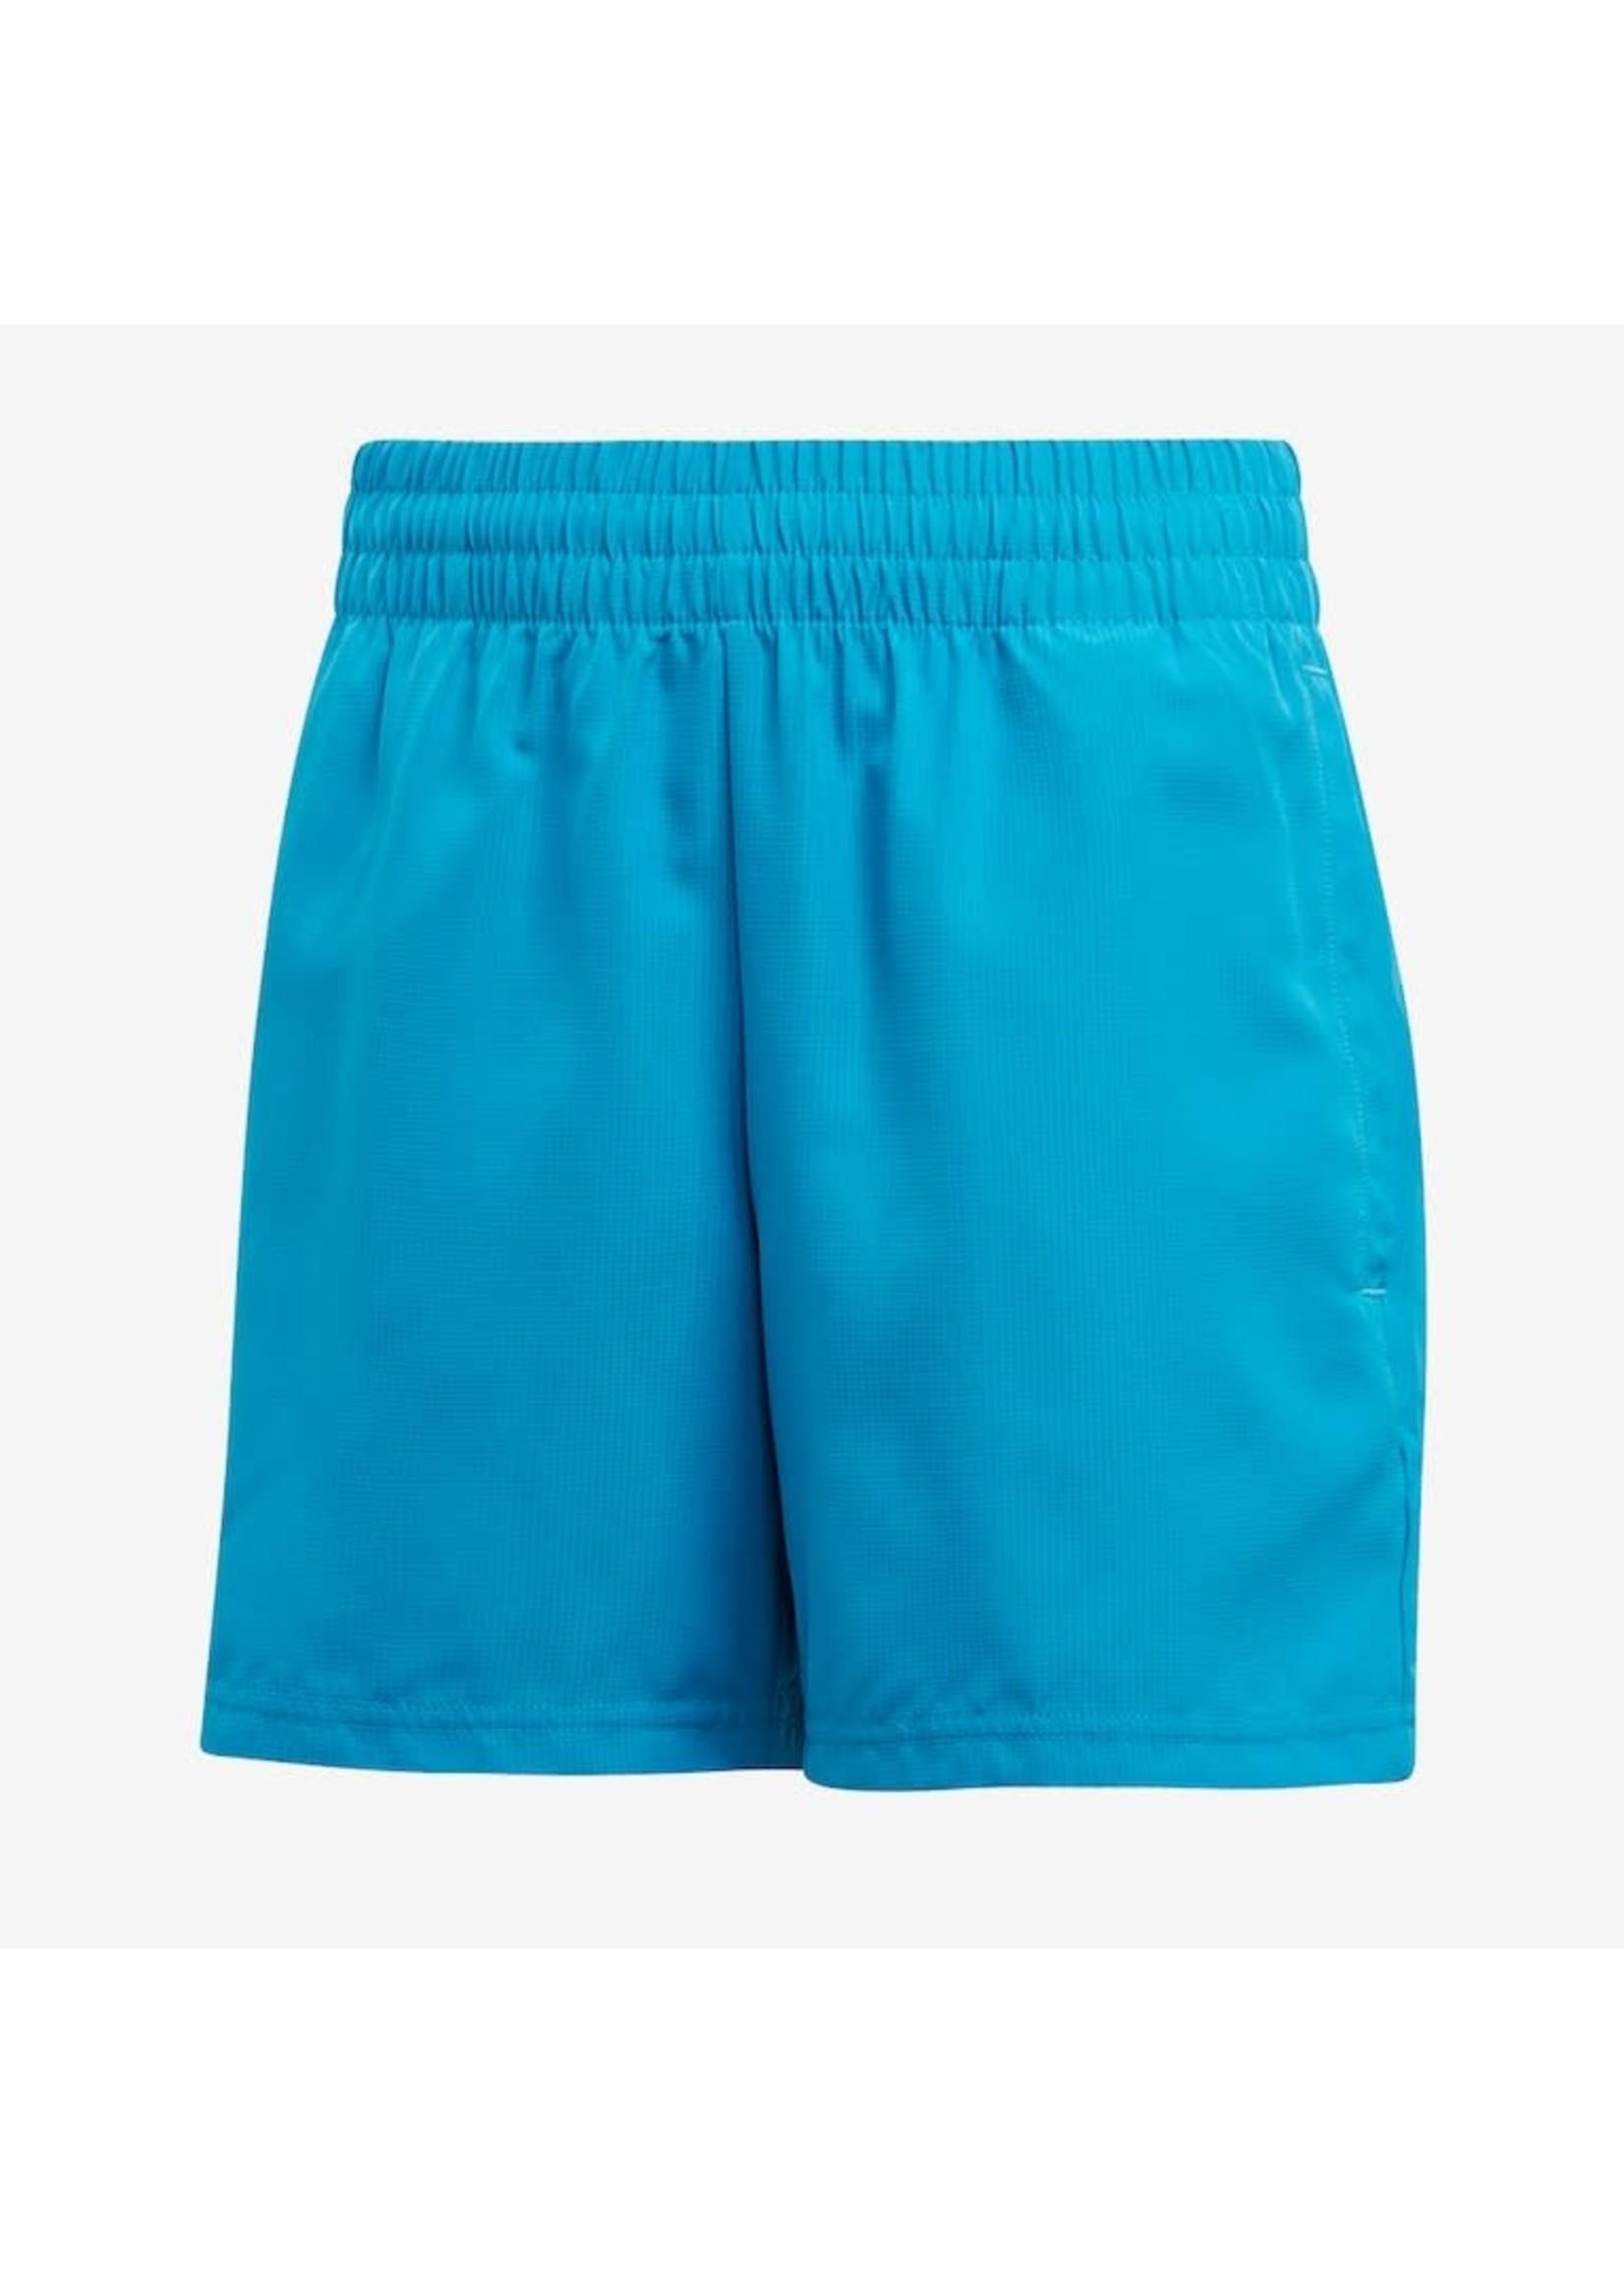 Adidas Adidas Club Junior Short (2019)